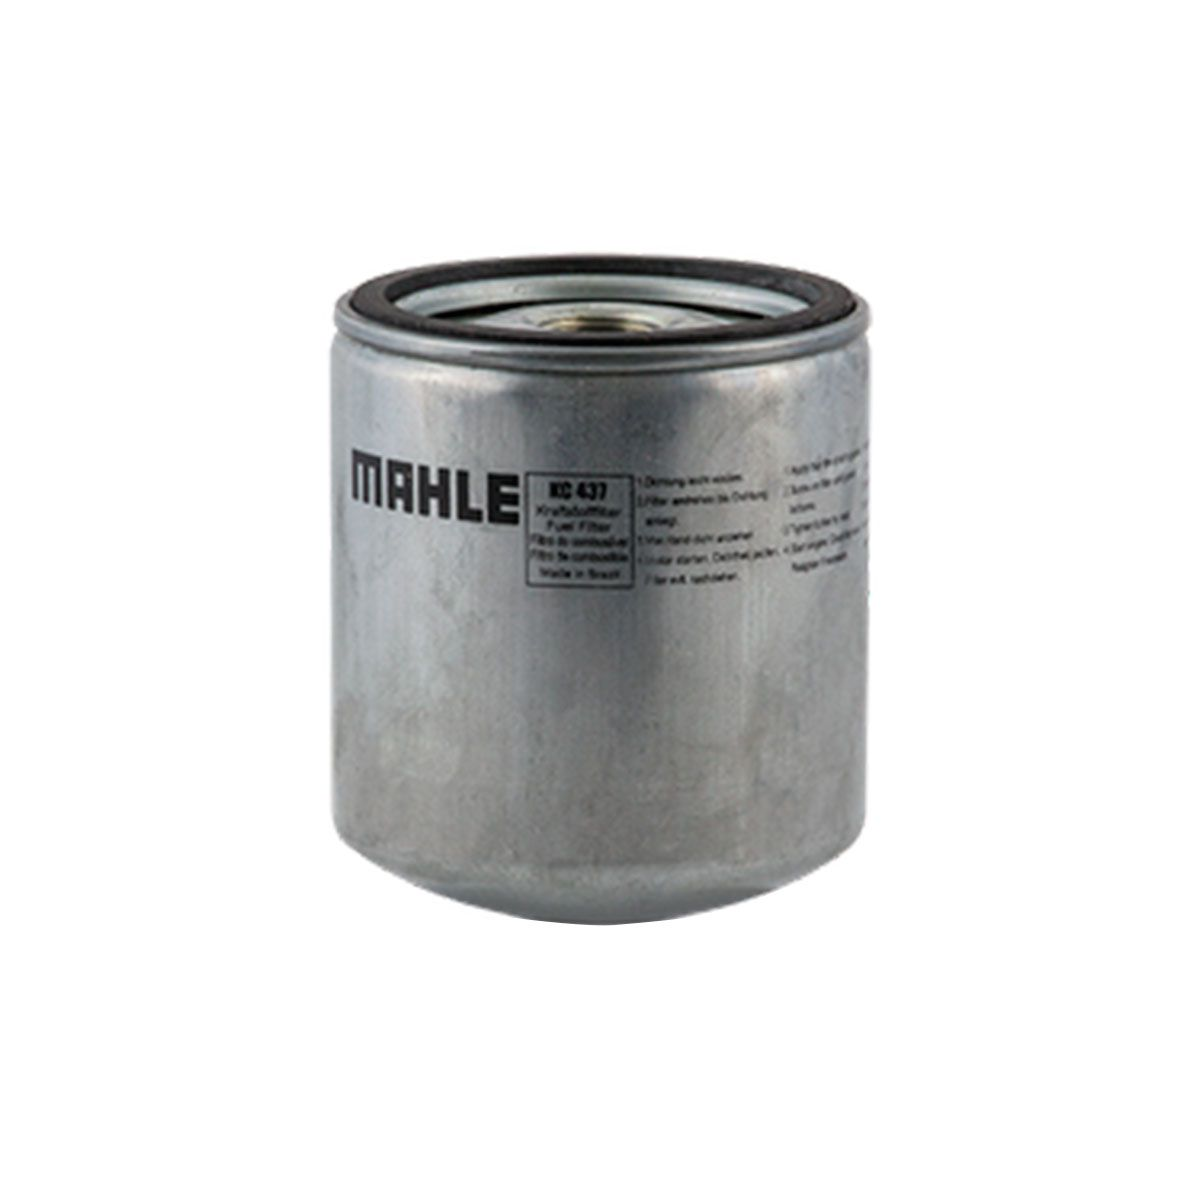 Filtro de Combustível Mahle VW 13150 17210 23210 7100 7110 8120 8150 9150